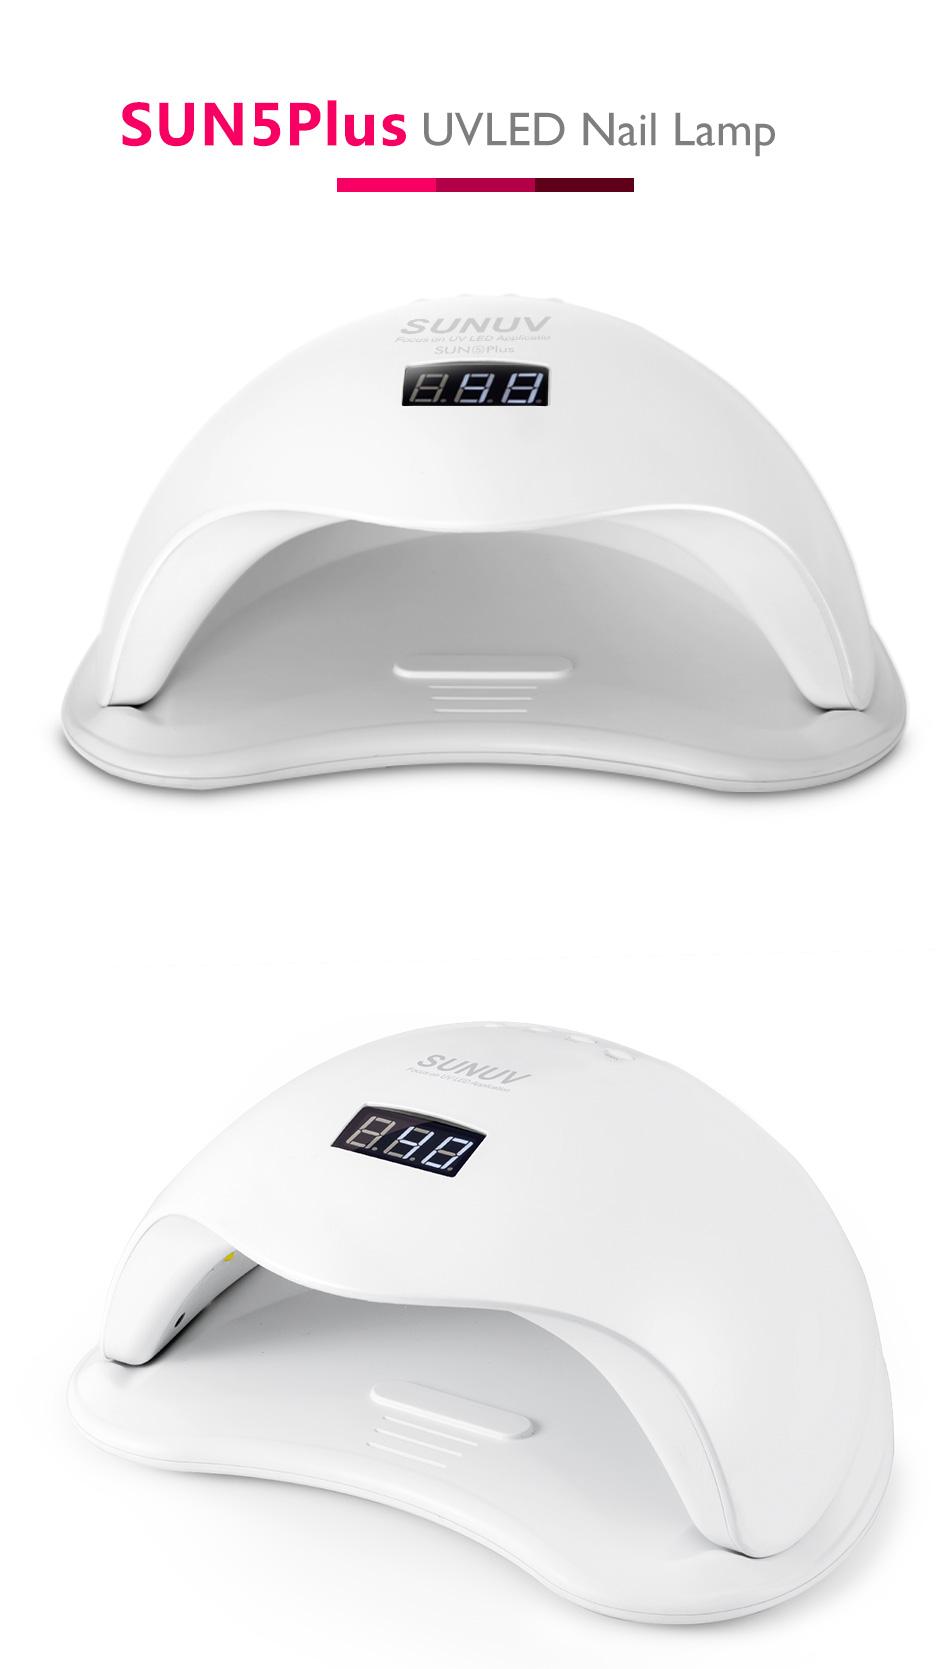 Лампа для сушки ногтей SUNUV SUN5 Plus 48W Smart 2.0 - фото HTB1nLnLbhSYBuNjSsphq6zGvVXaQ.jpg